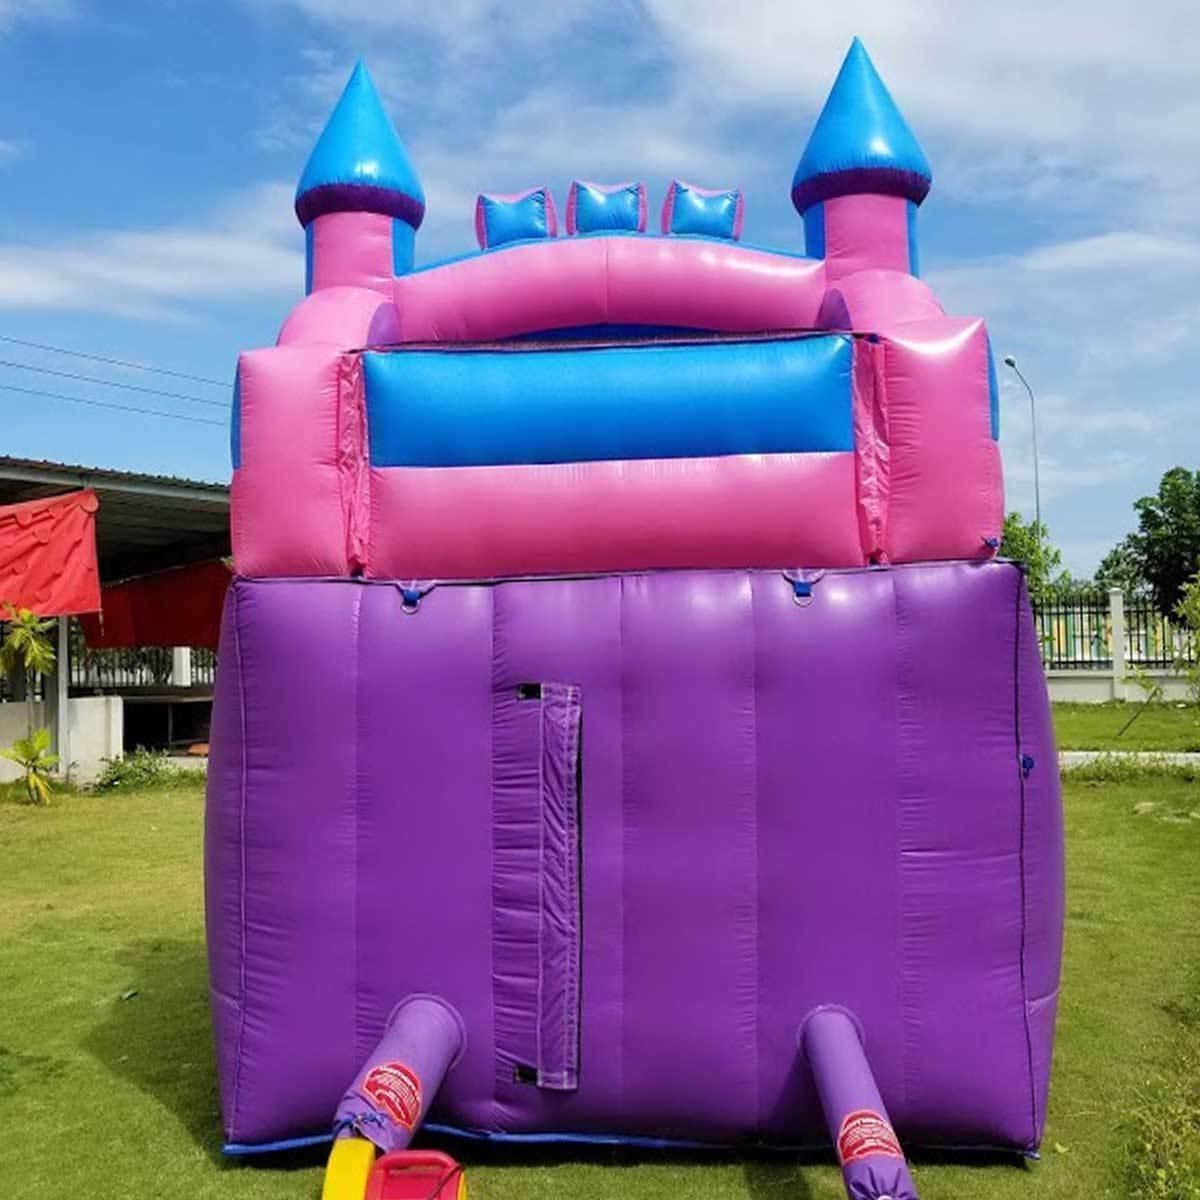 Pink Inflatable Water Slide Lane Bouncy Dry &